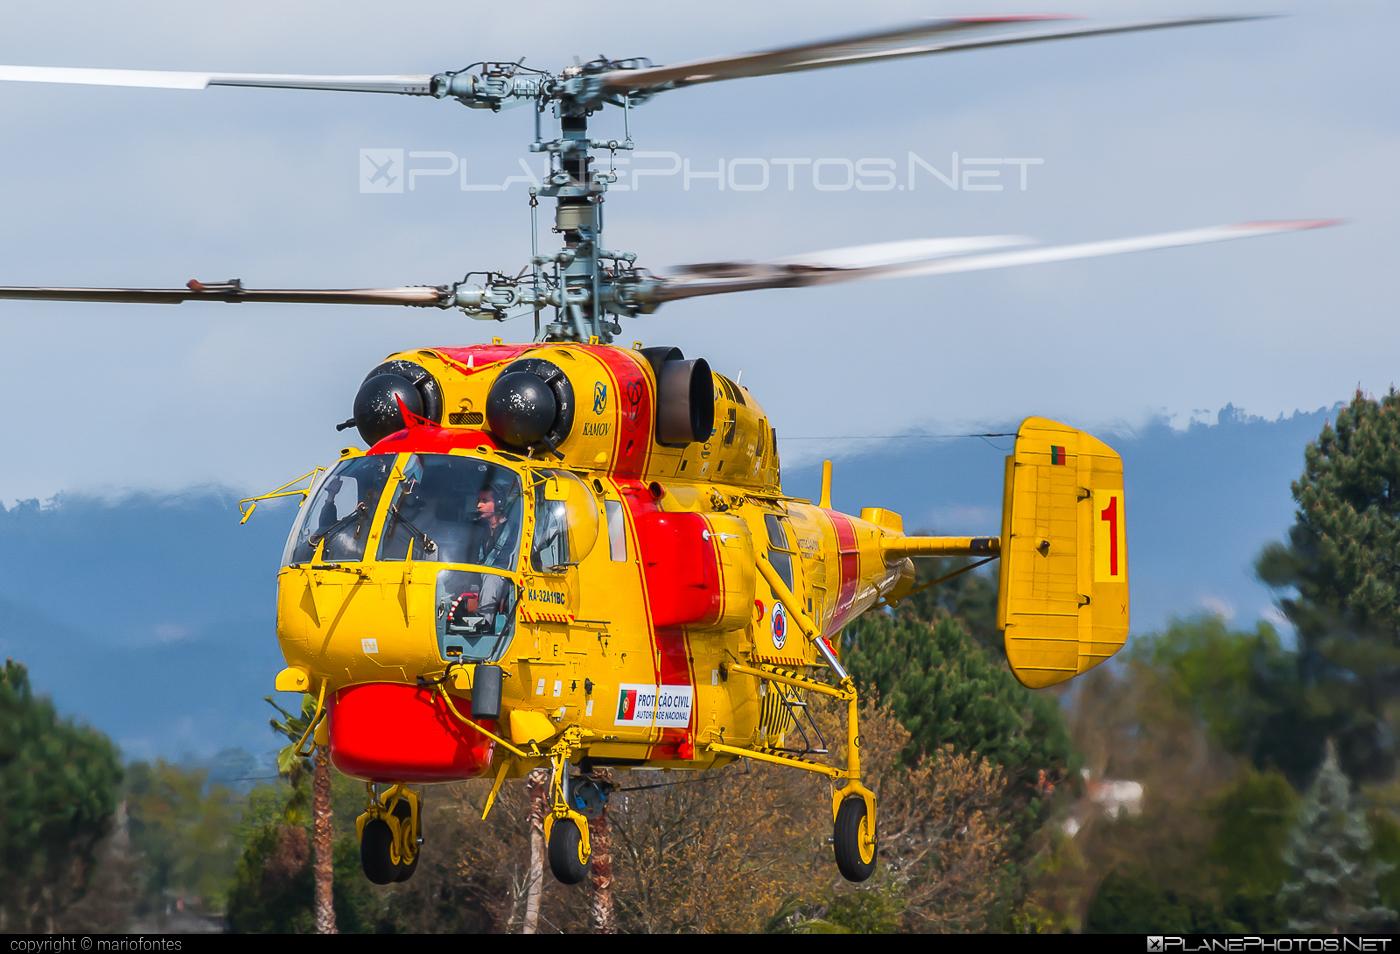 Kamov Ka-32A11BC - CS-HMP operated by Proteção Civil (Portugal Civil Protection) #ka32 #ka32a11bc #kamov #kamov32 #kamovka32 #portugalcivilprotection #protecaocivil